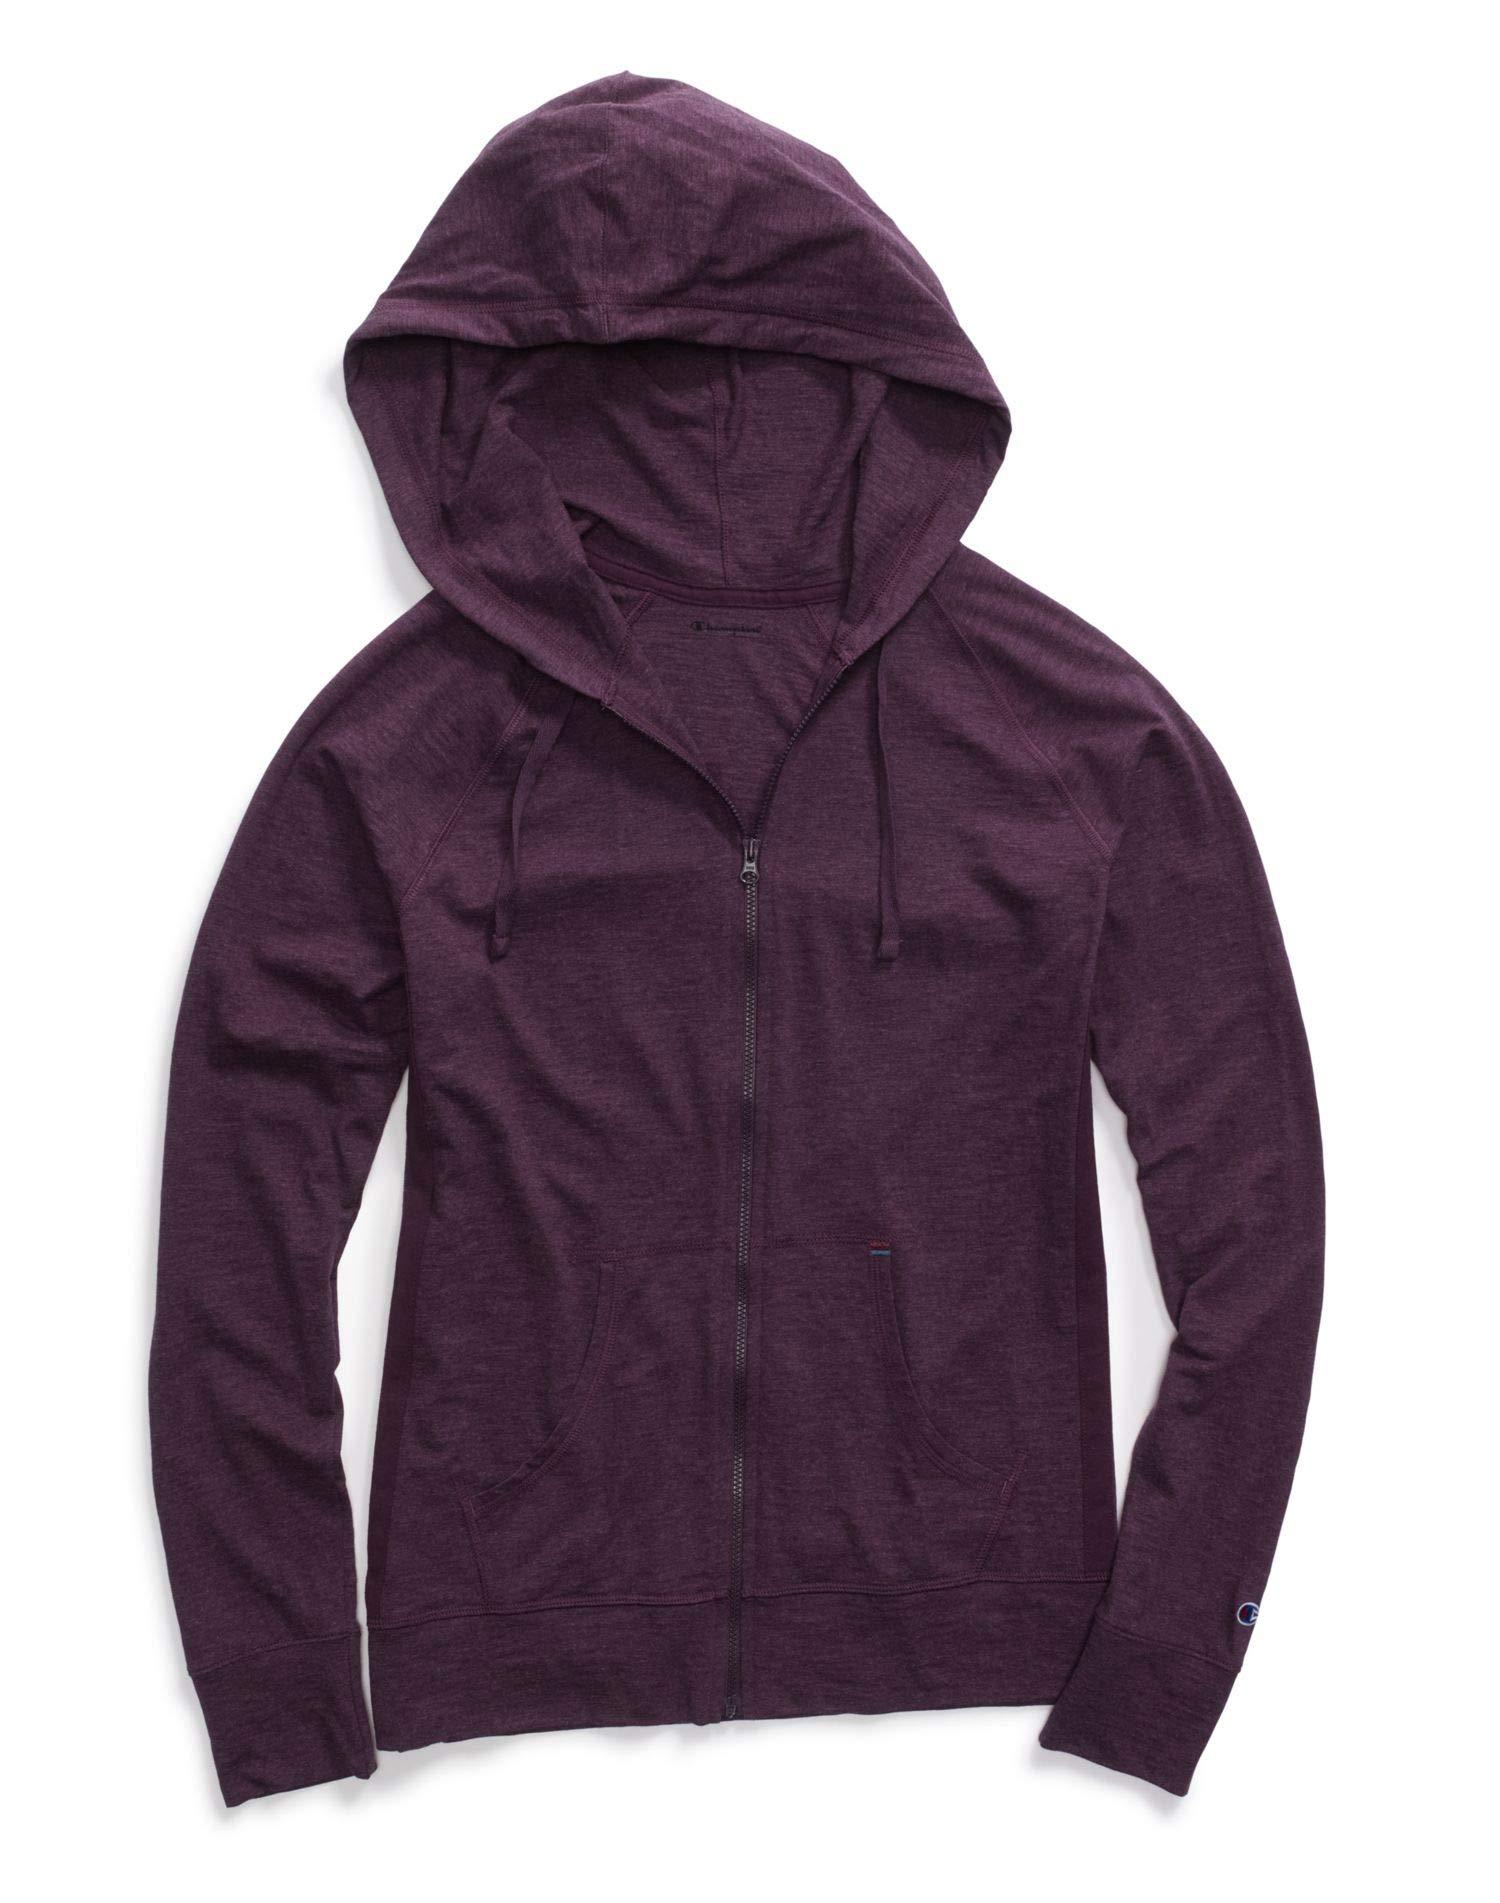 Champion Women's Heathered Jersey Jacket, Dark Berry Purple Heather, XX-Large